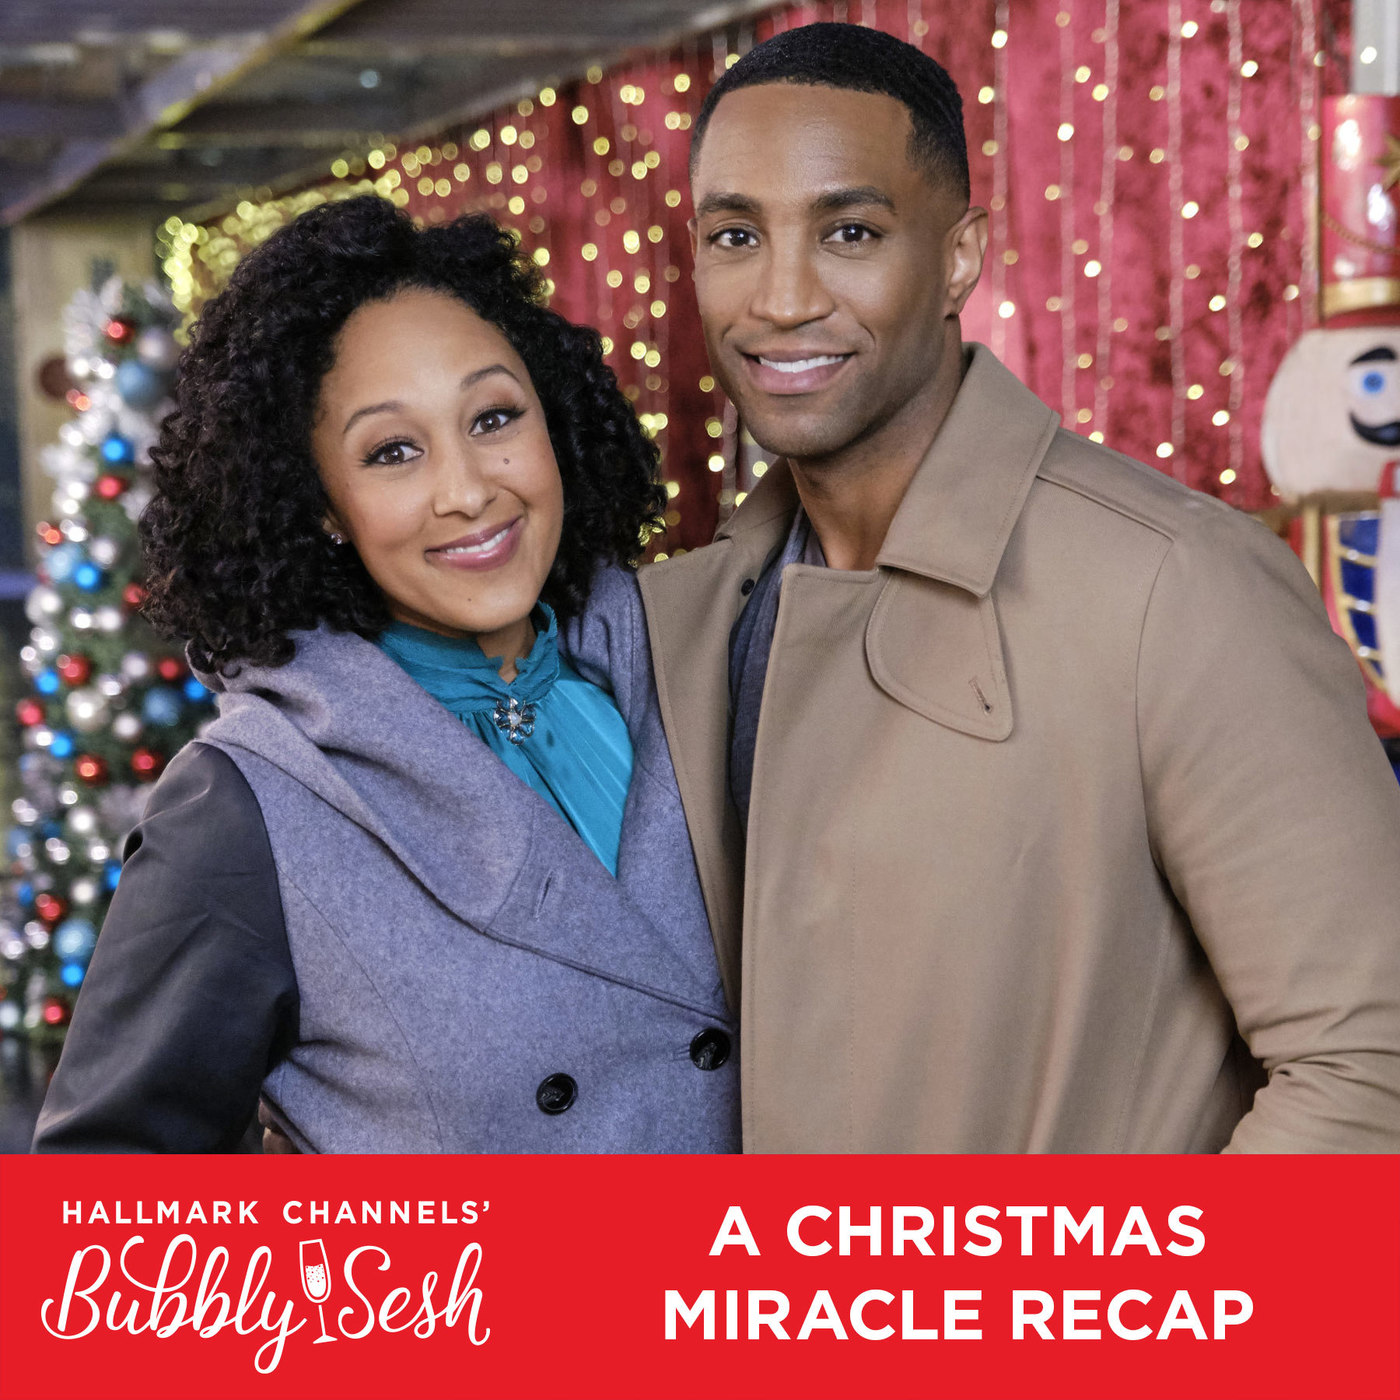 A Christmas Miracle Recap